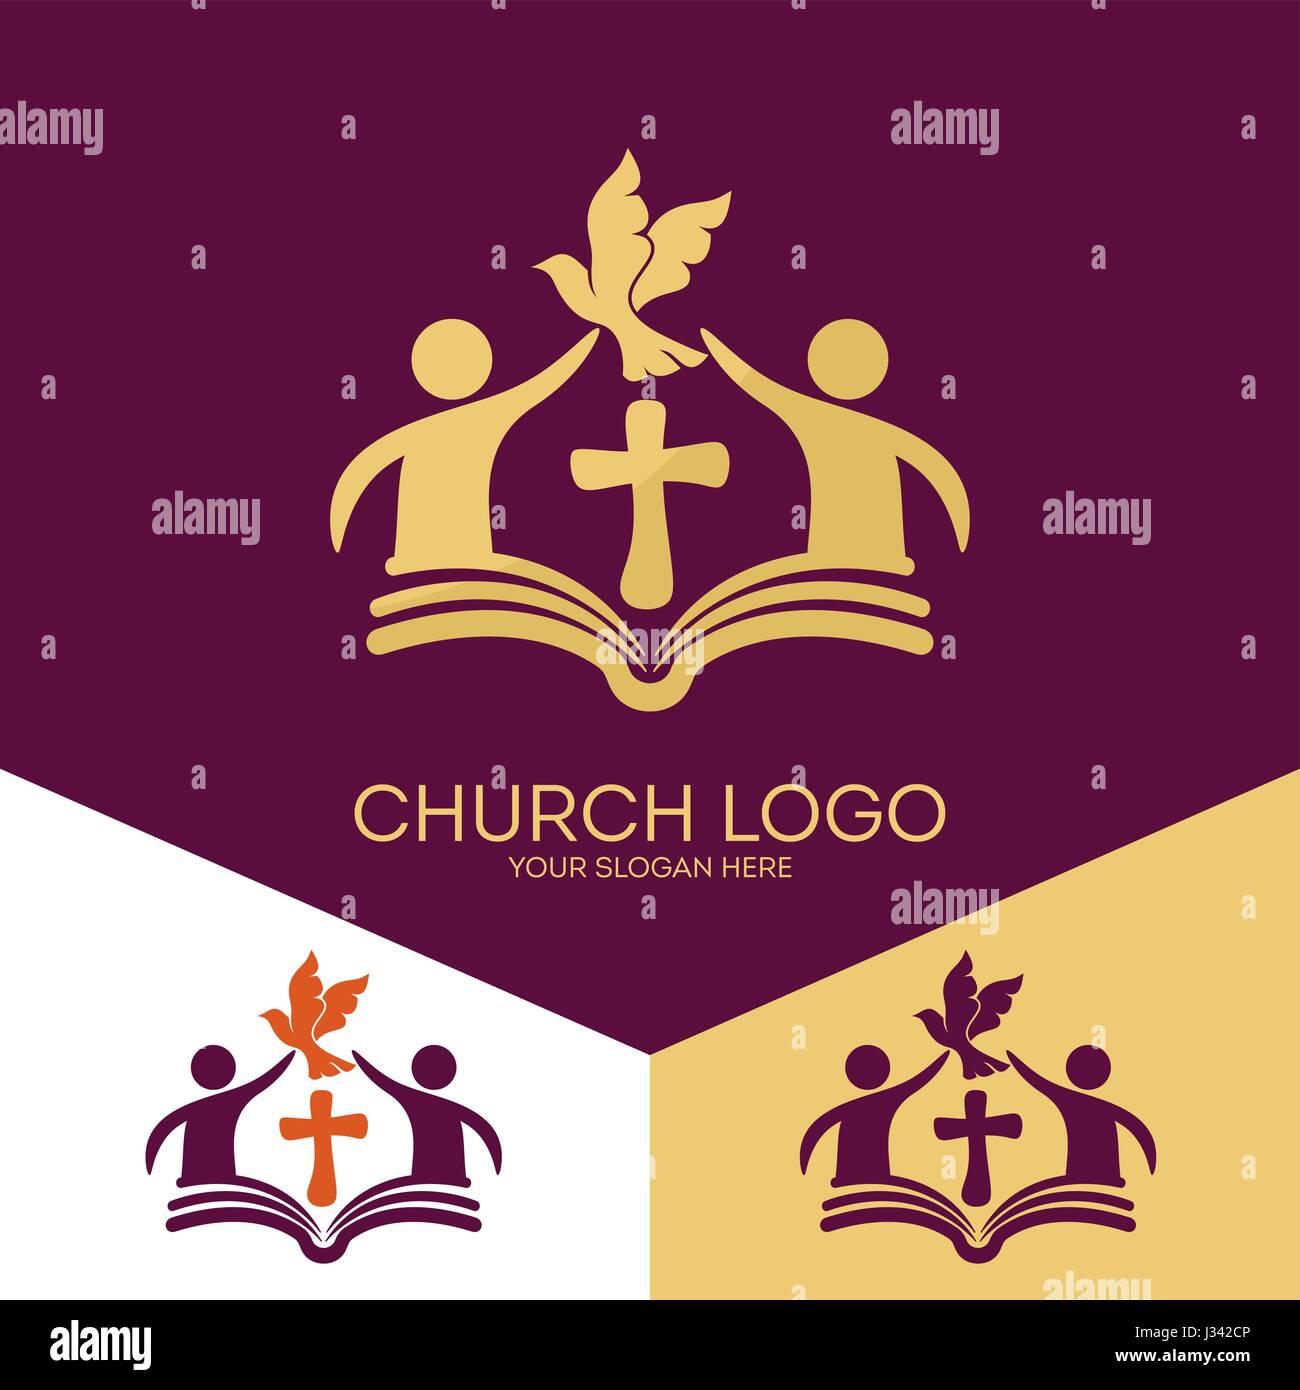 Church logo christian symbols church of god faithful to the christian symbols church of god faithful to the lord jesus christ bible the foundation of faith biocorpaavc Gallery